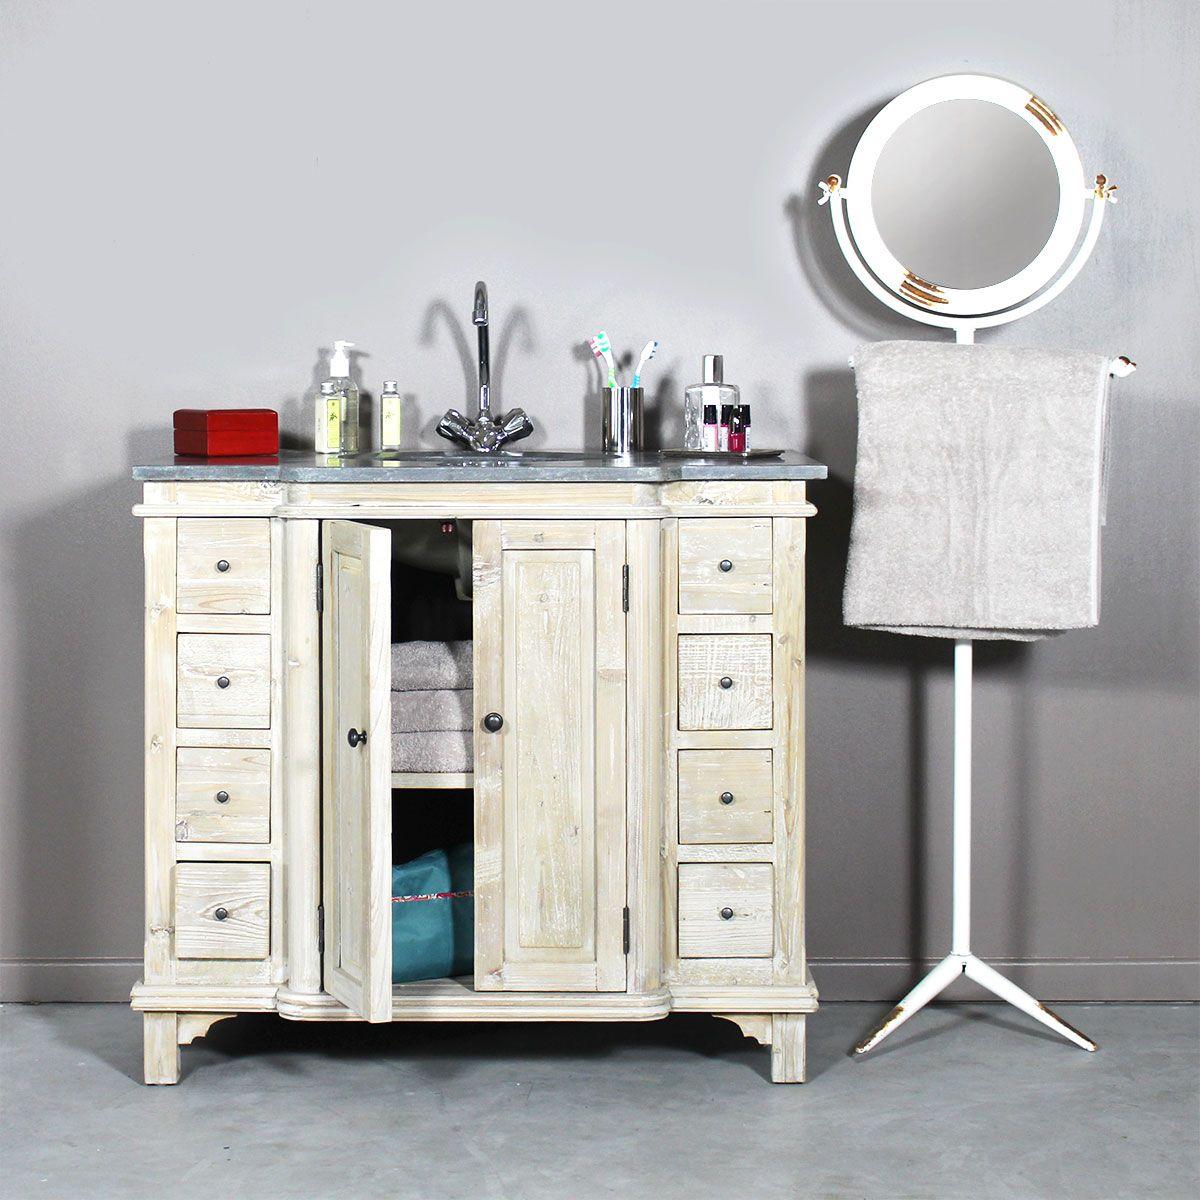 Meuble salle de bain bois massif 1 vasque 2 portes 8 Customiser un meuble de salle de bain